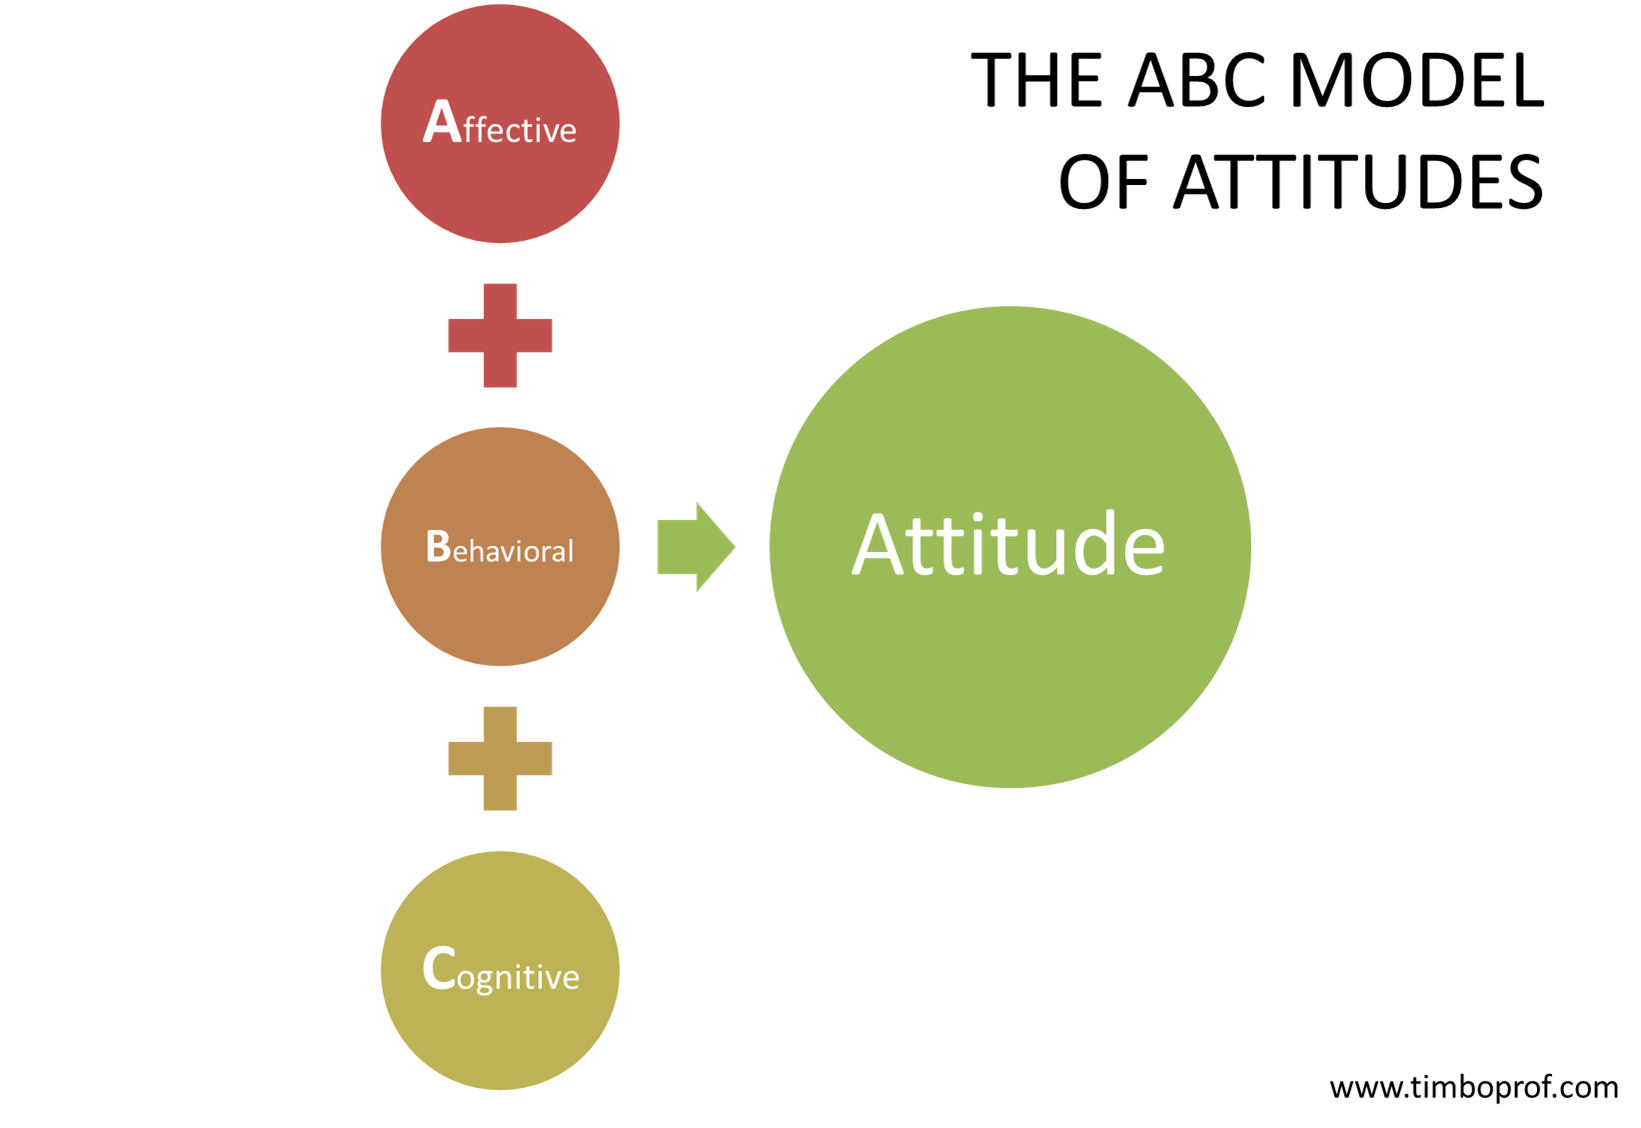 The Graphic Illustrates The Abc Model Of Attitudes